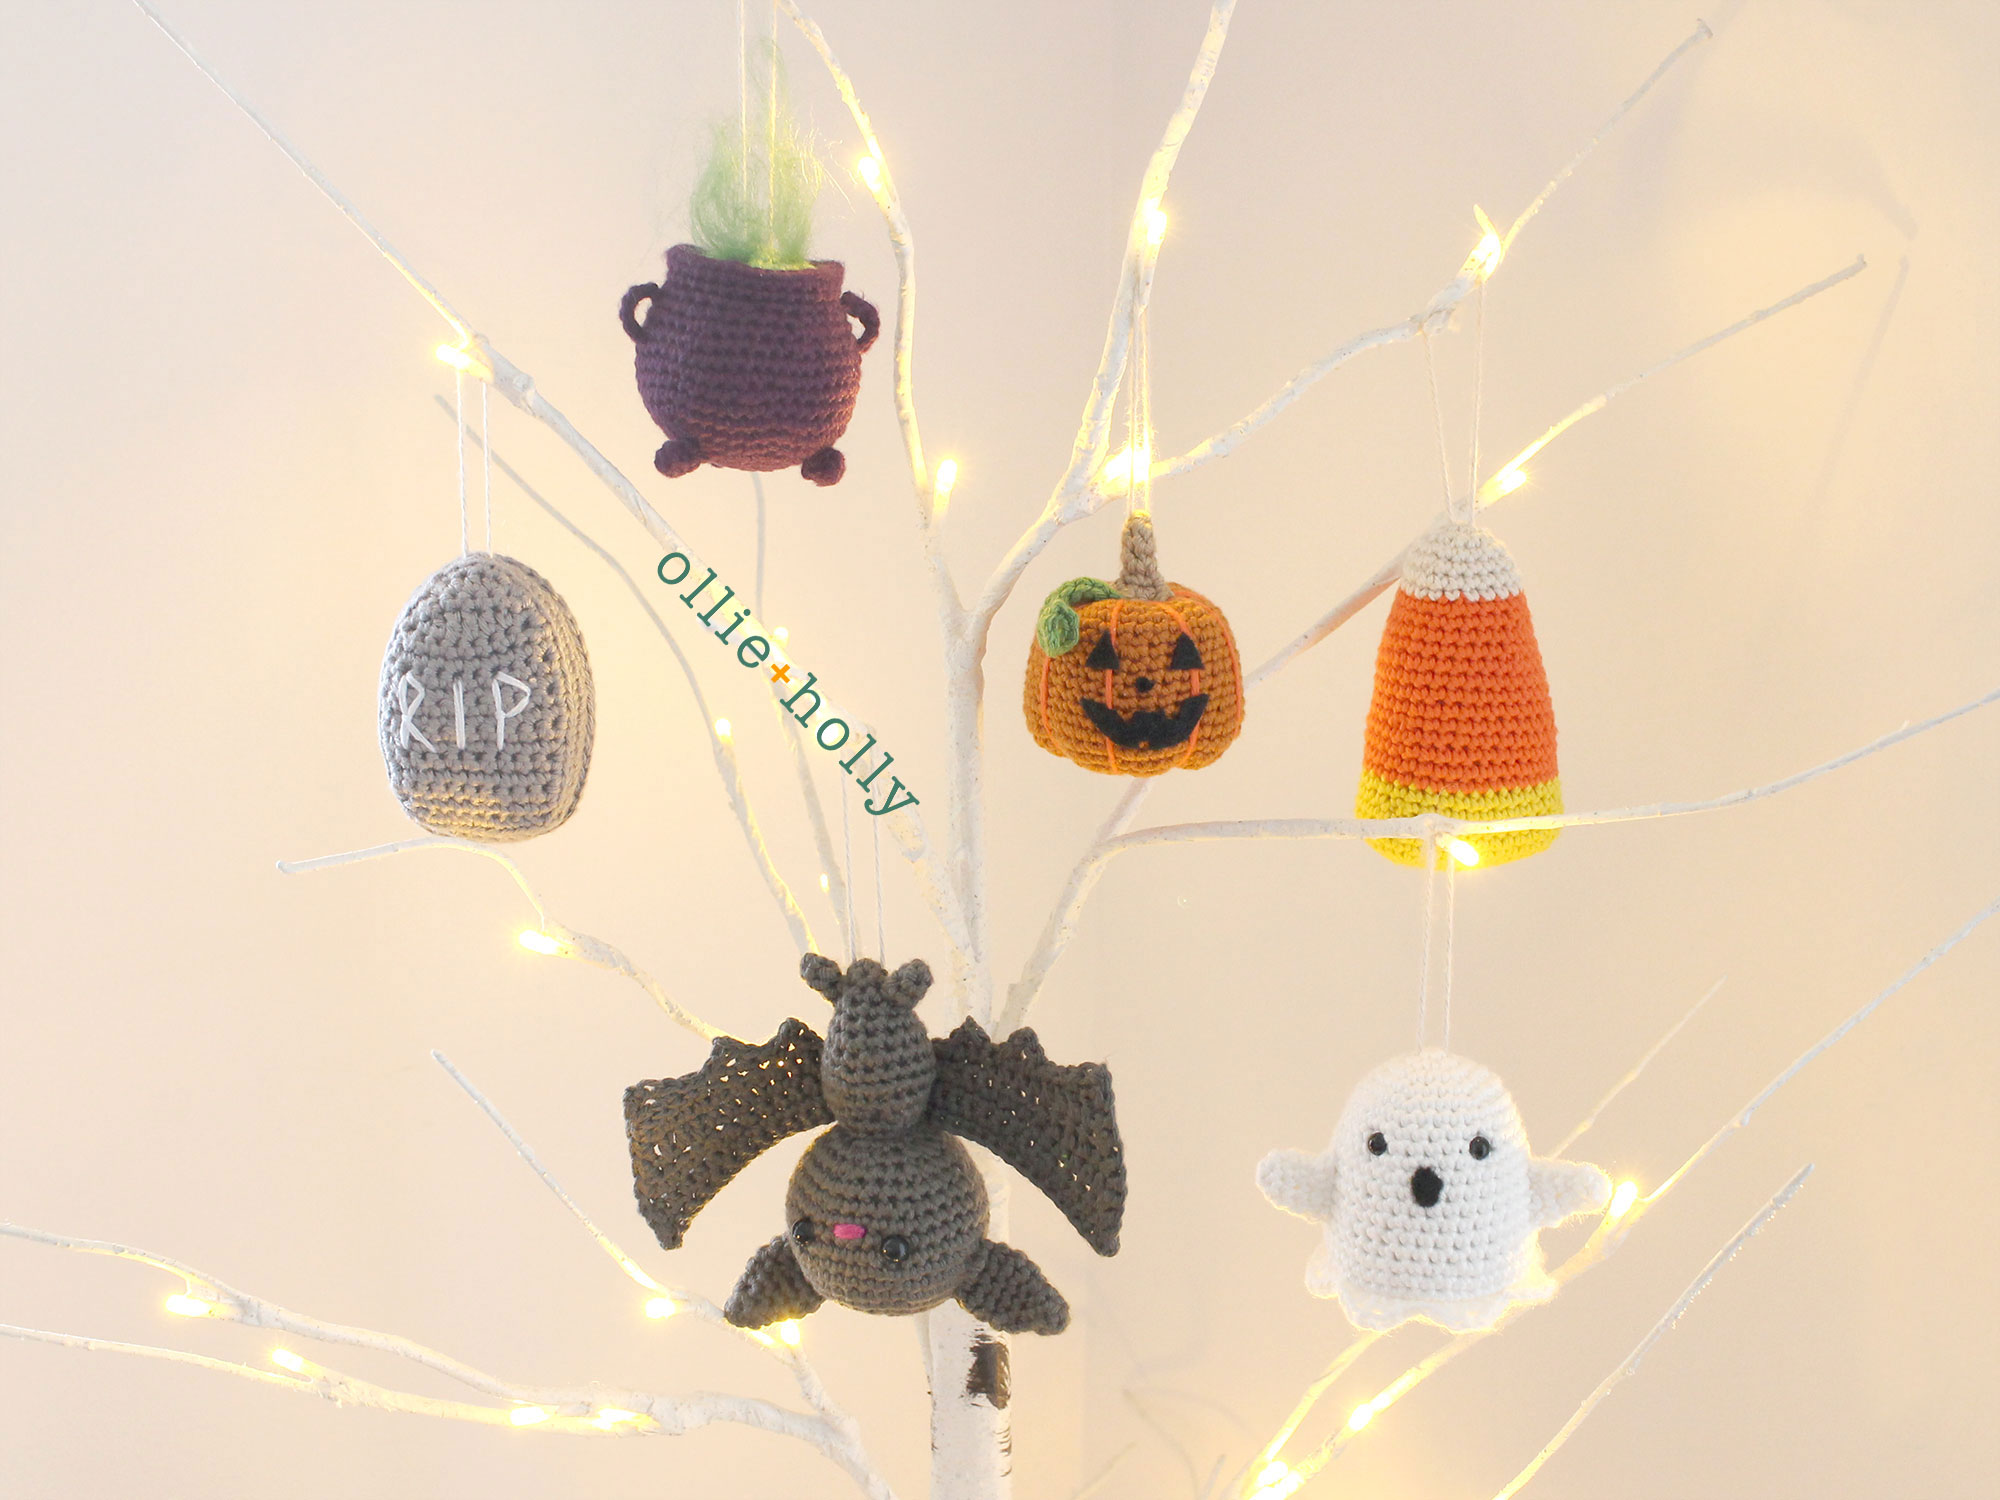 Free Halloween Tree DIY Ornaments Amigurumi Crochet Collection All